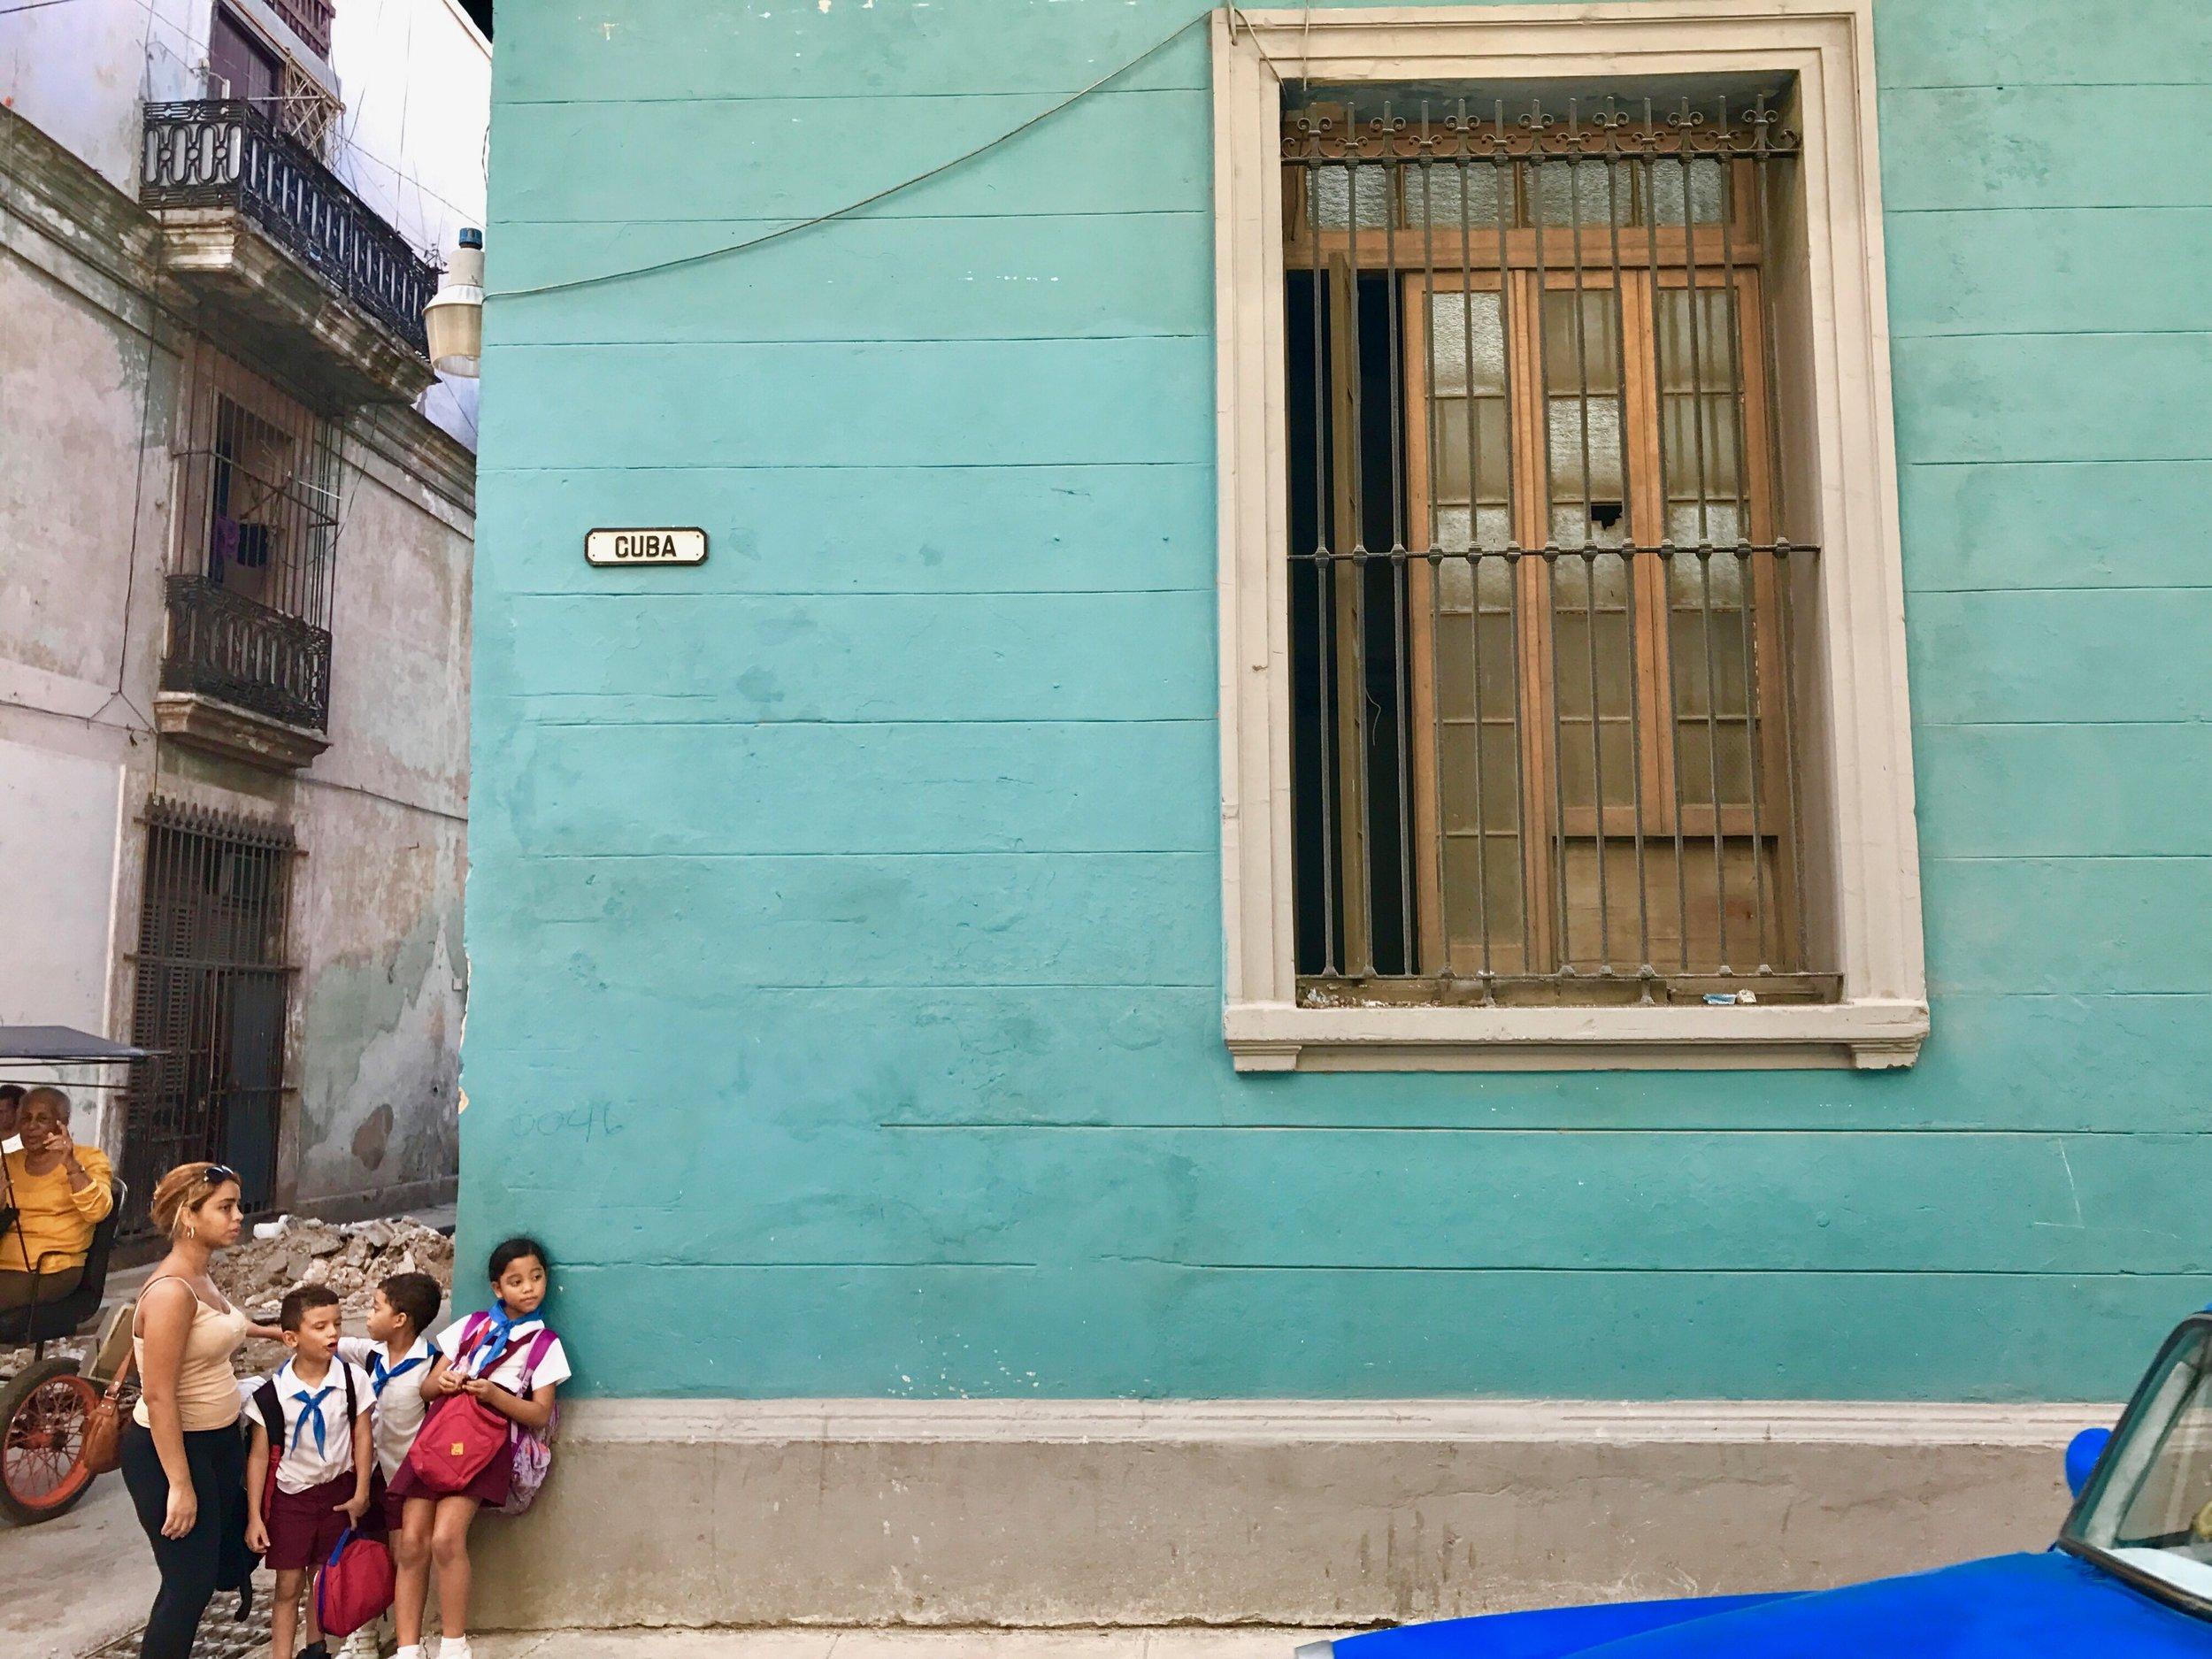 Kids Headed to School - Cuba - Photo by Jason Jackson